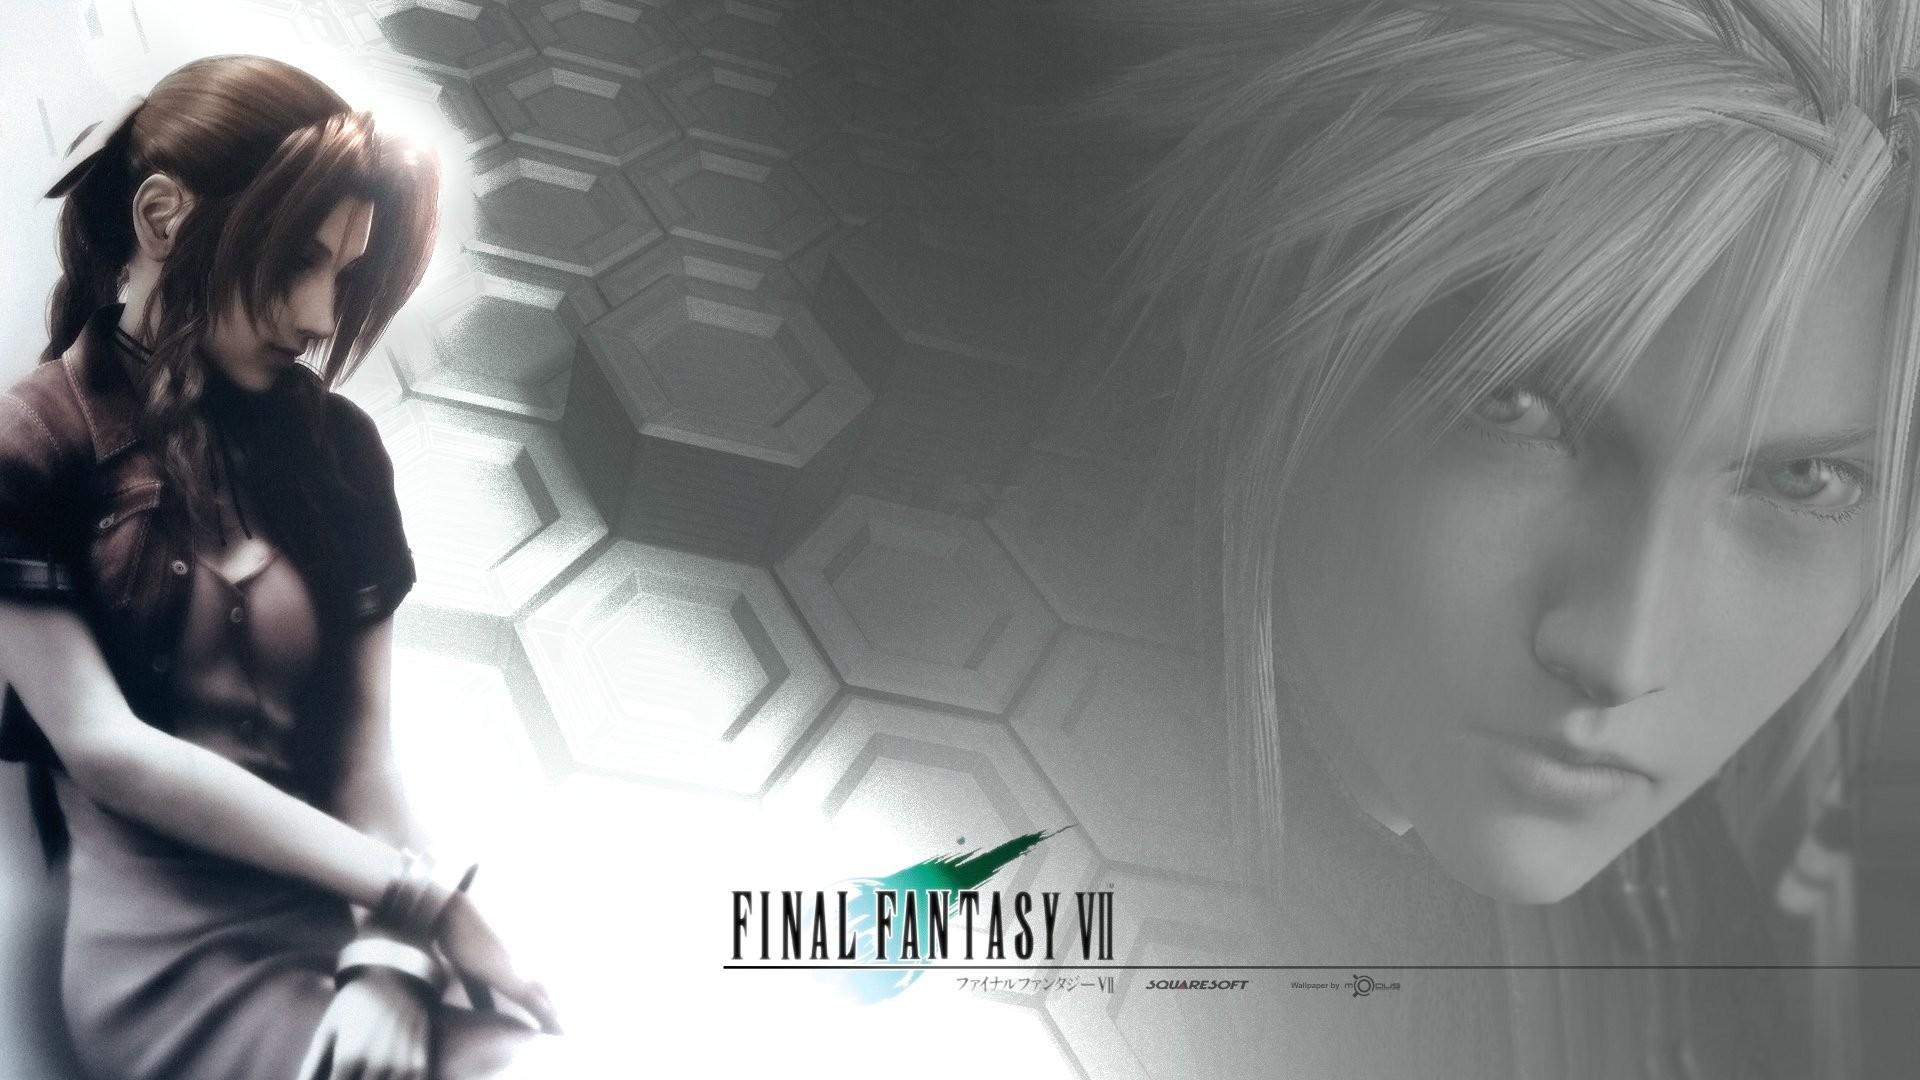 Tifa Lockhart Final Fantasy Artwork Hd Fantasy Girls 4k: Final Fantasy 7 Tifa Wallpaper (56+ Images